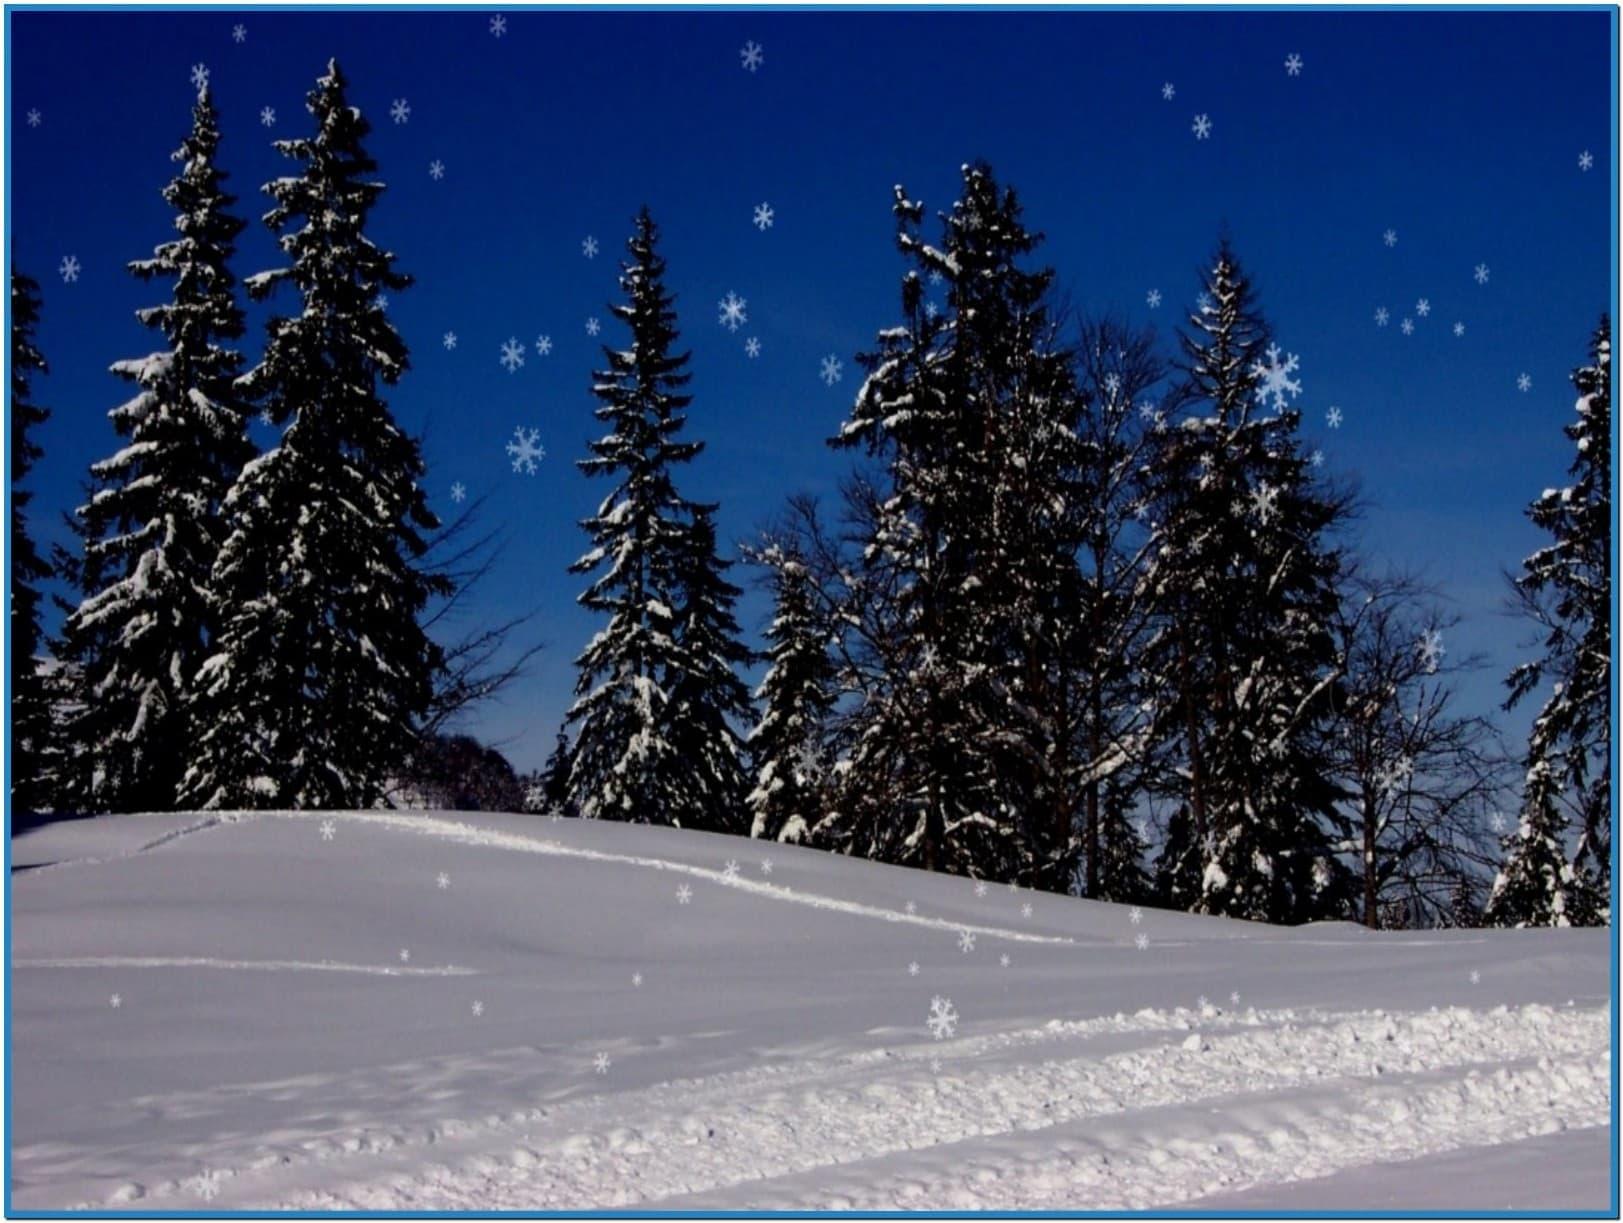 Christmas Screen Saver New Calendar Template Site 1623x1223